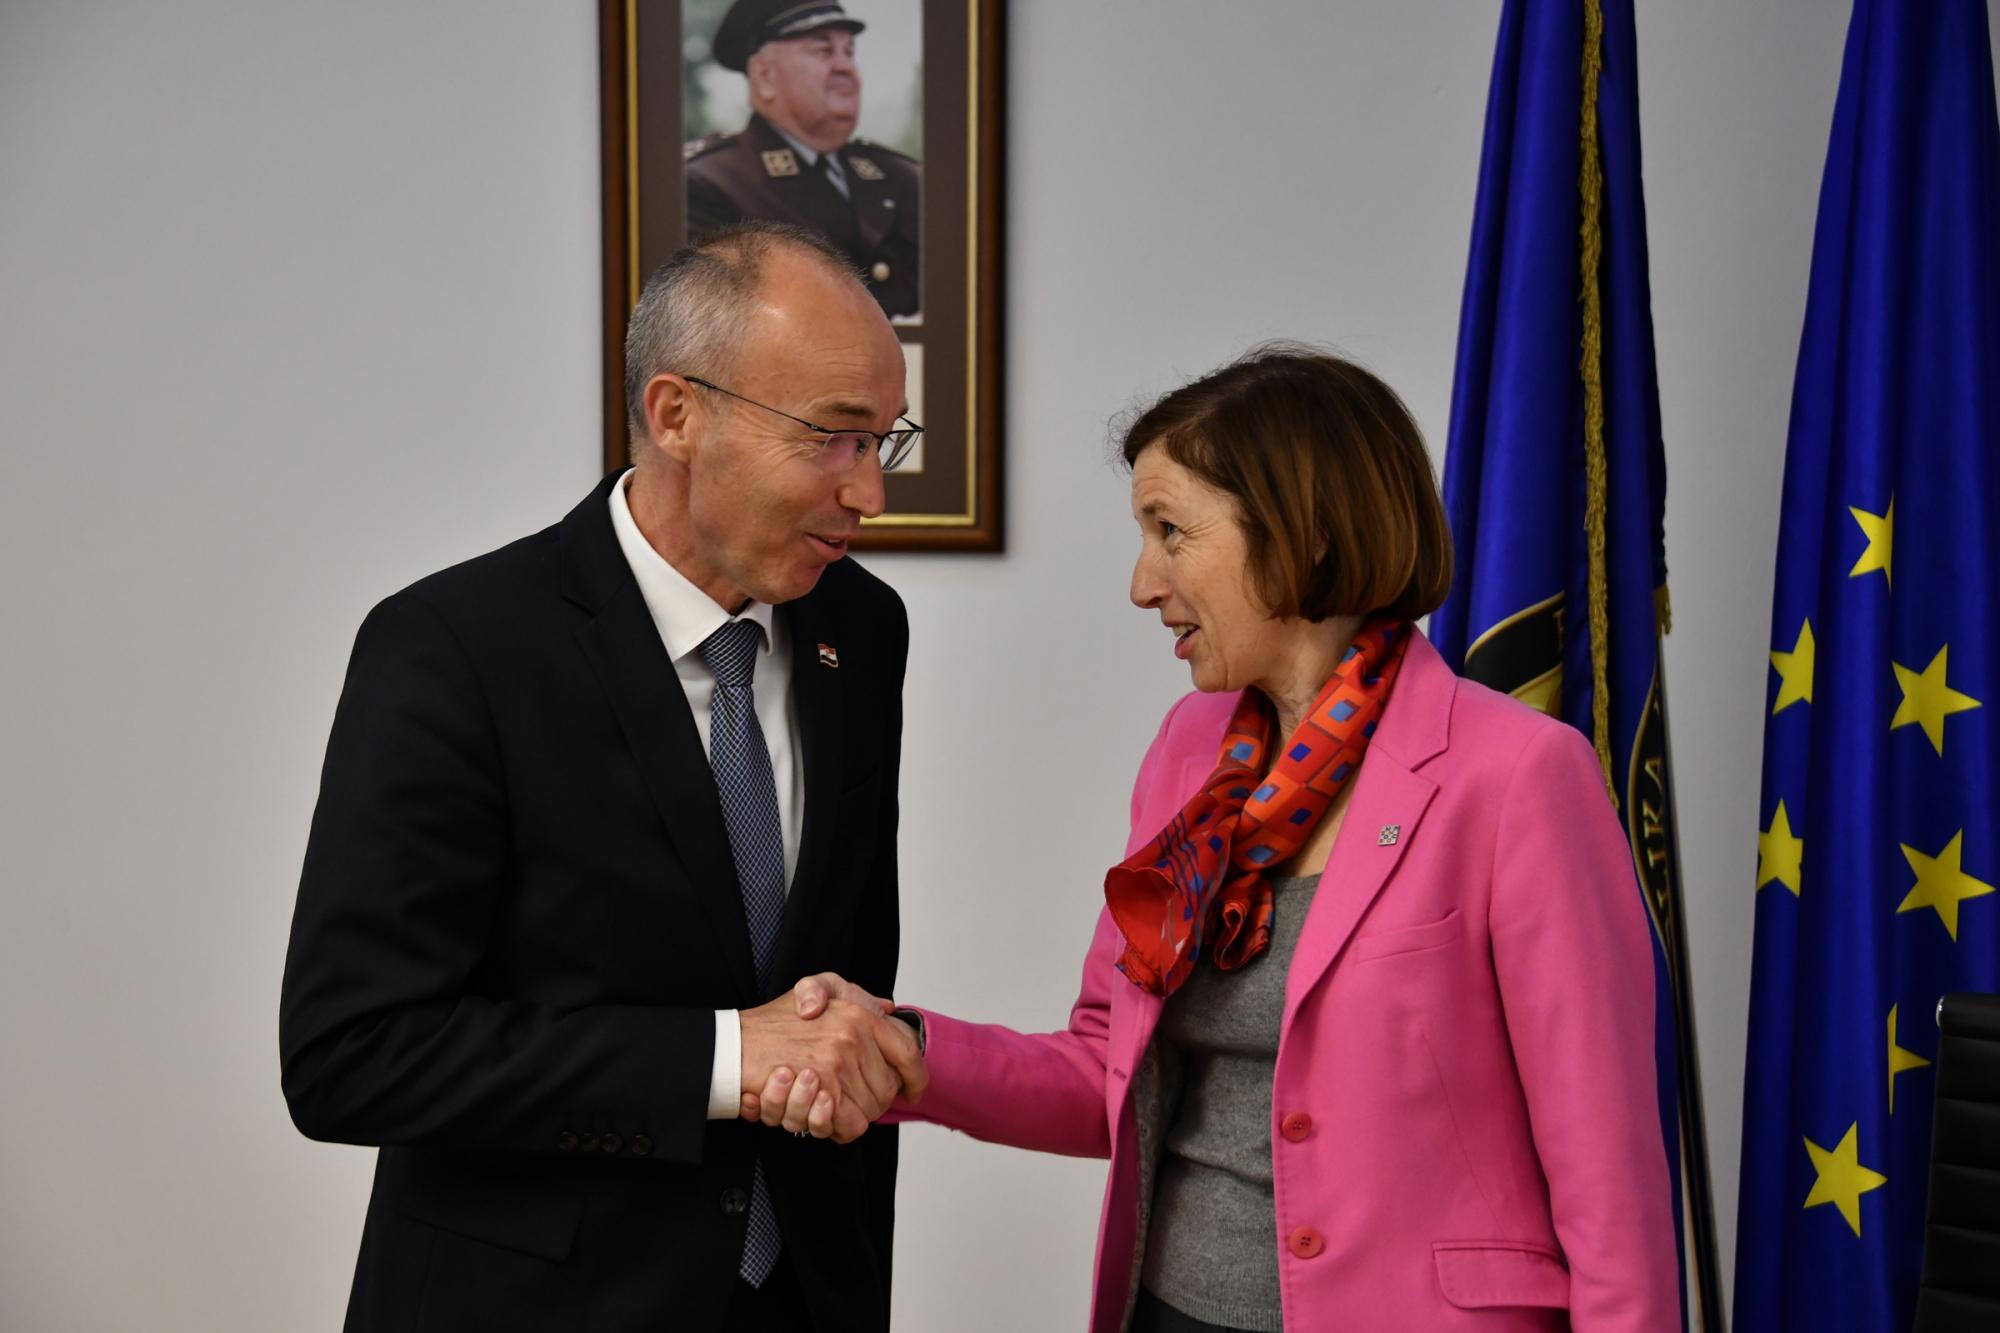 Ministar Krstičević sa francuskom ministricom Parly u MORH-u | Foto: MORH /F. Klen